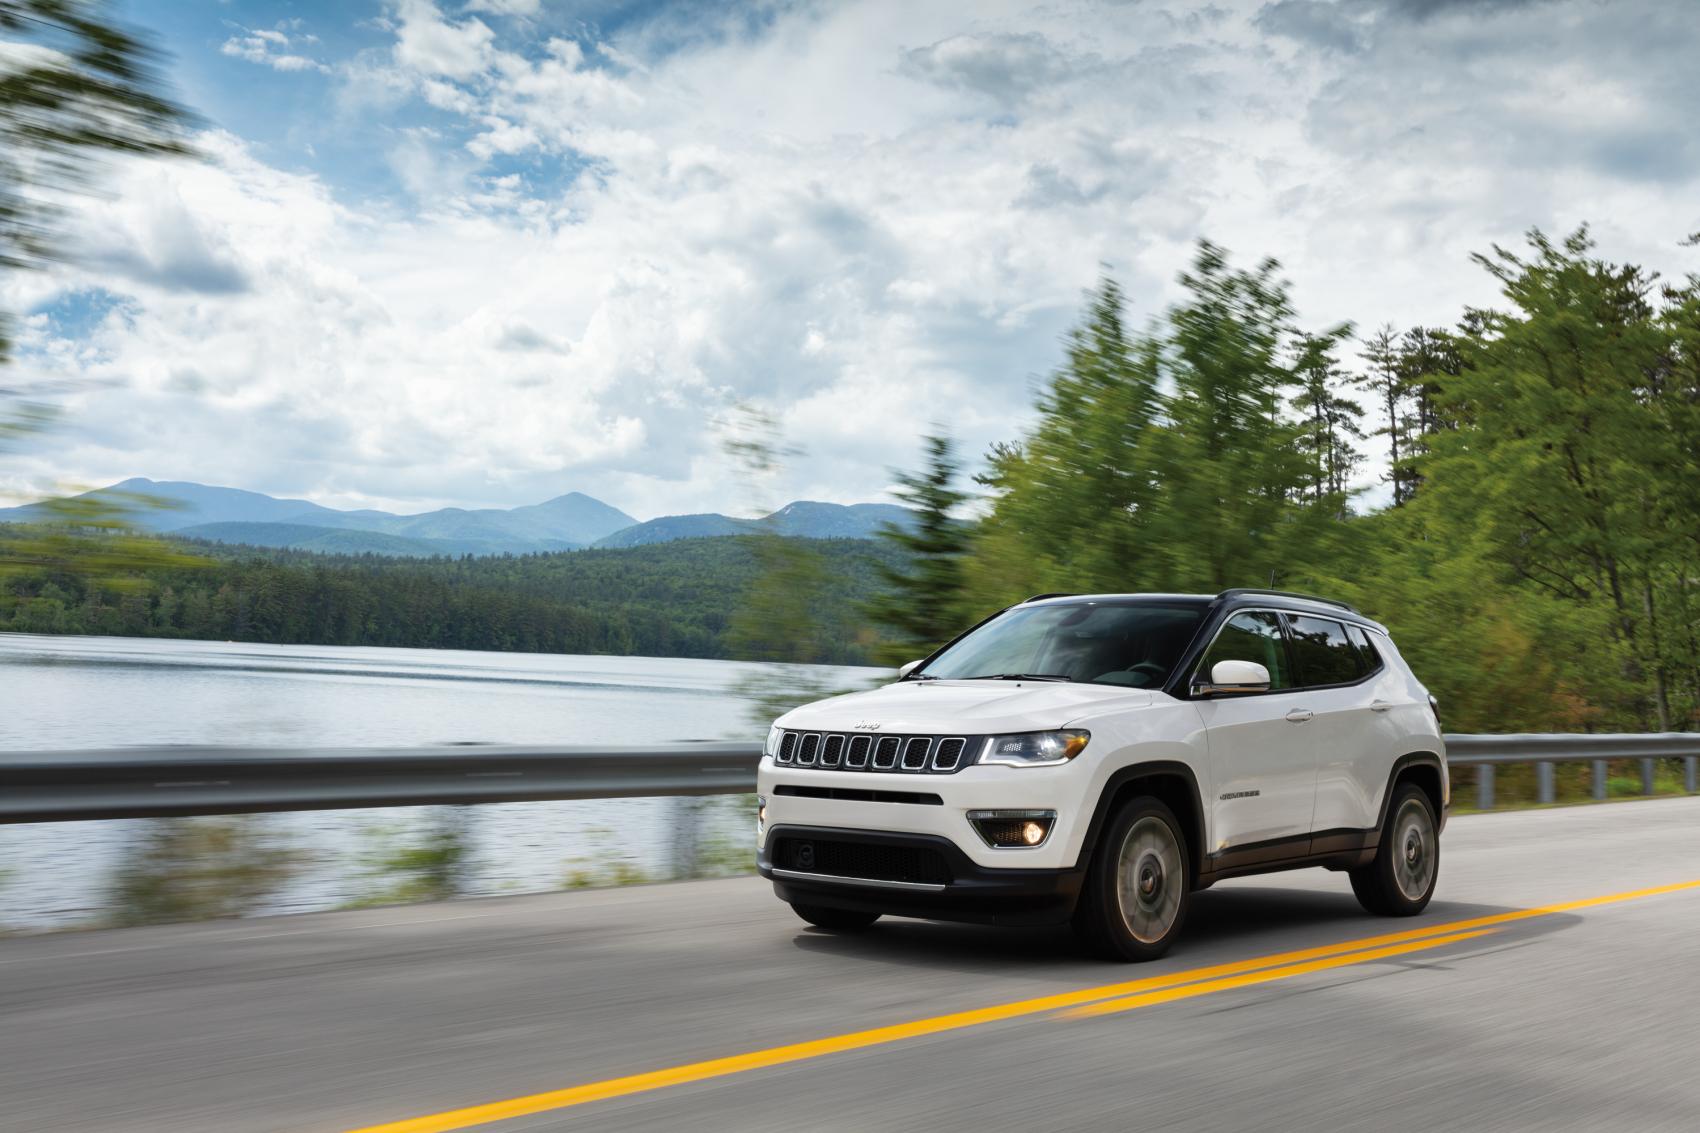 2021 Jeep Compass White Lake